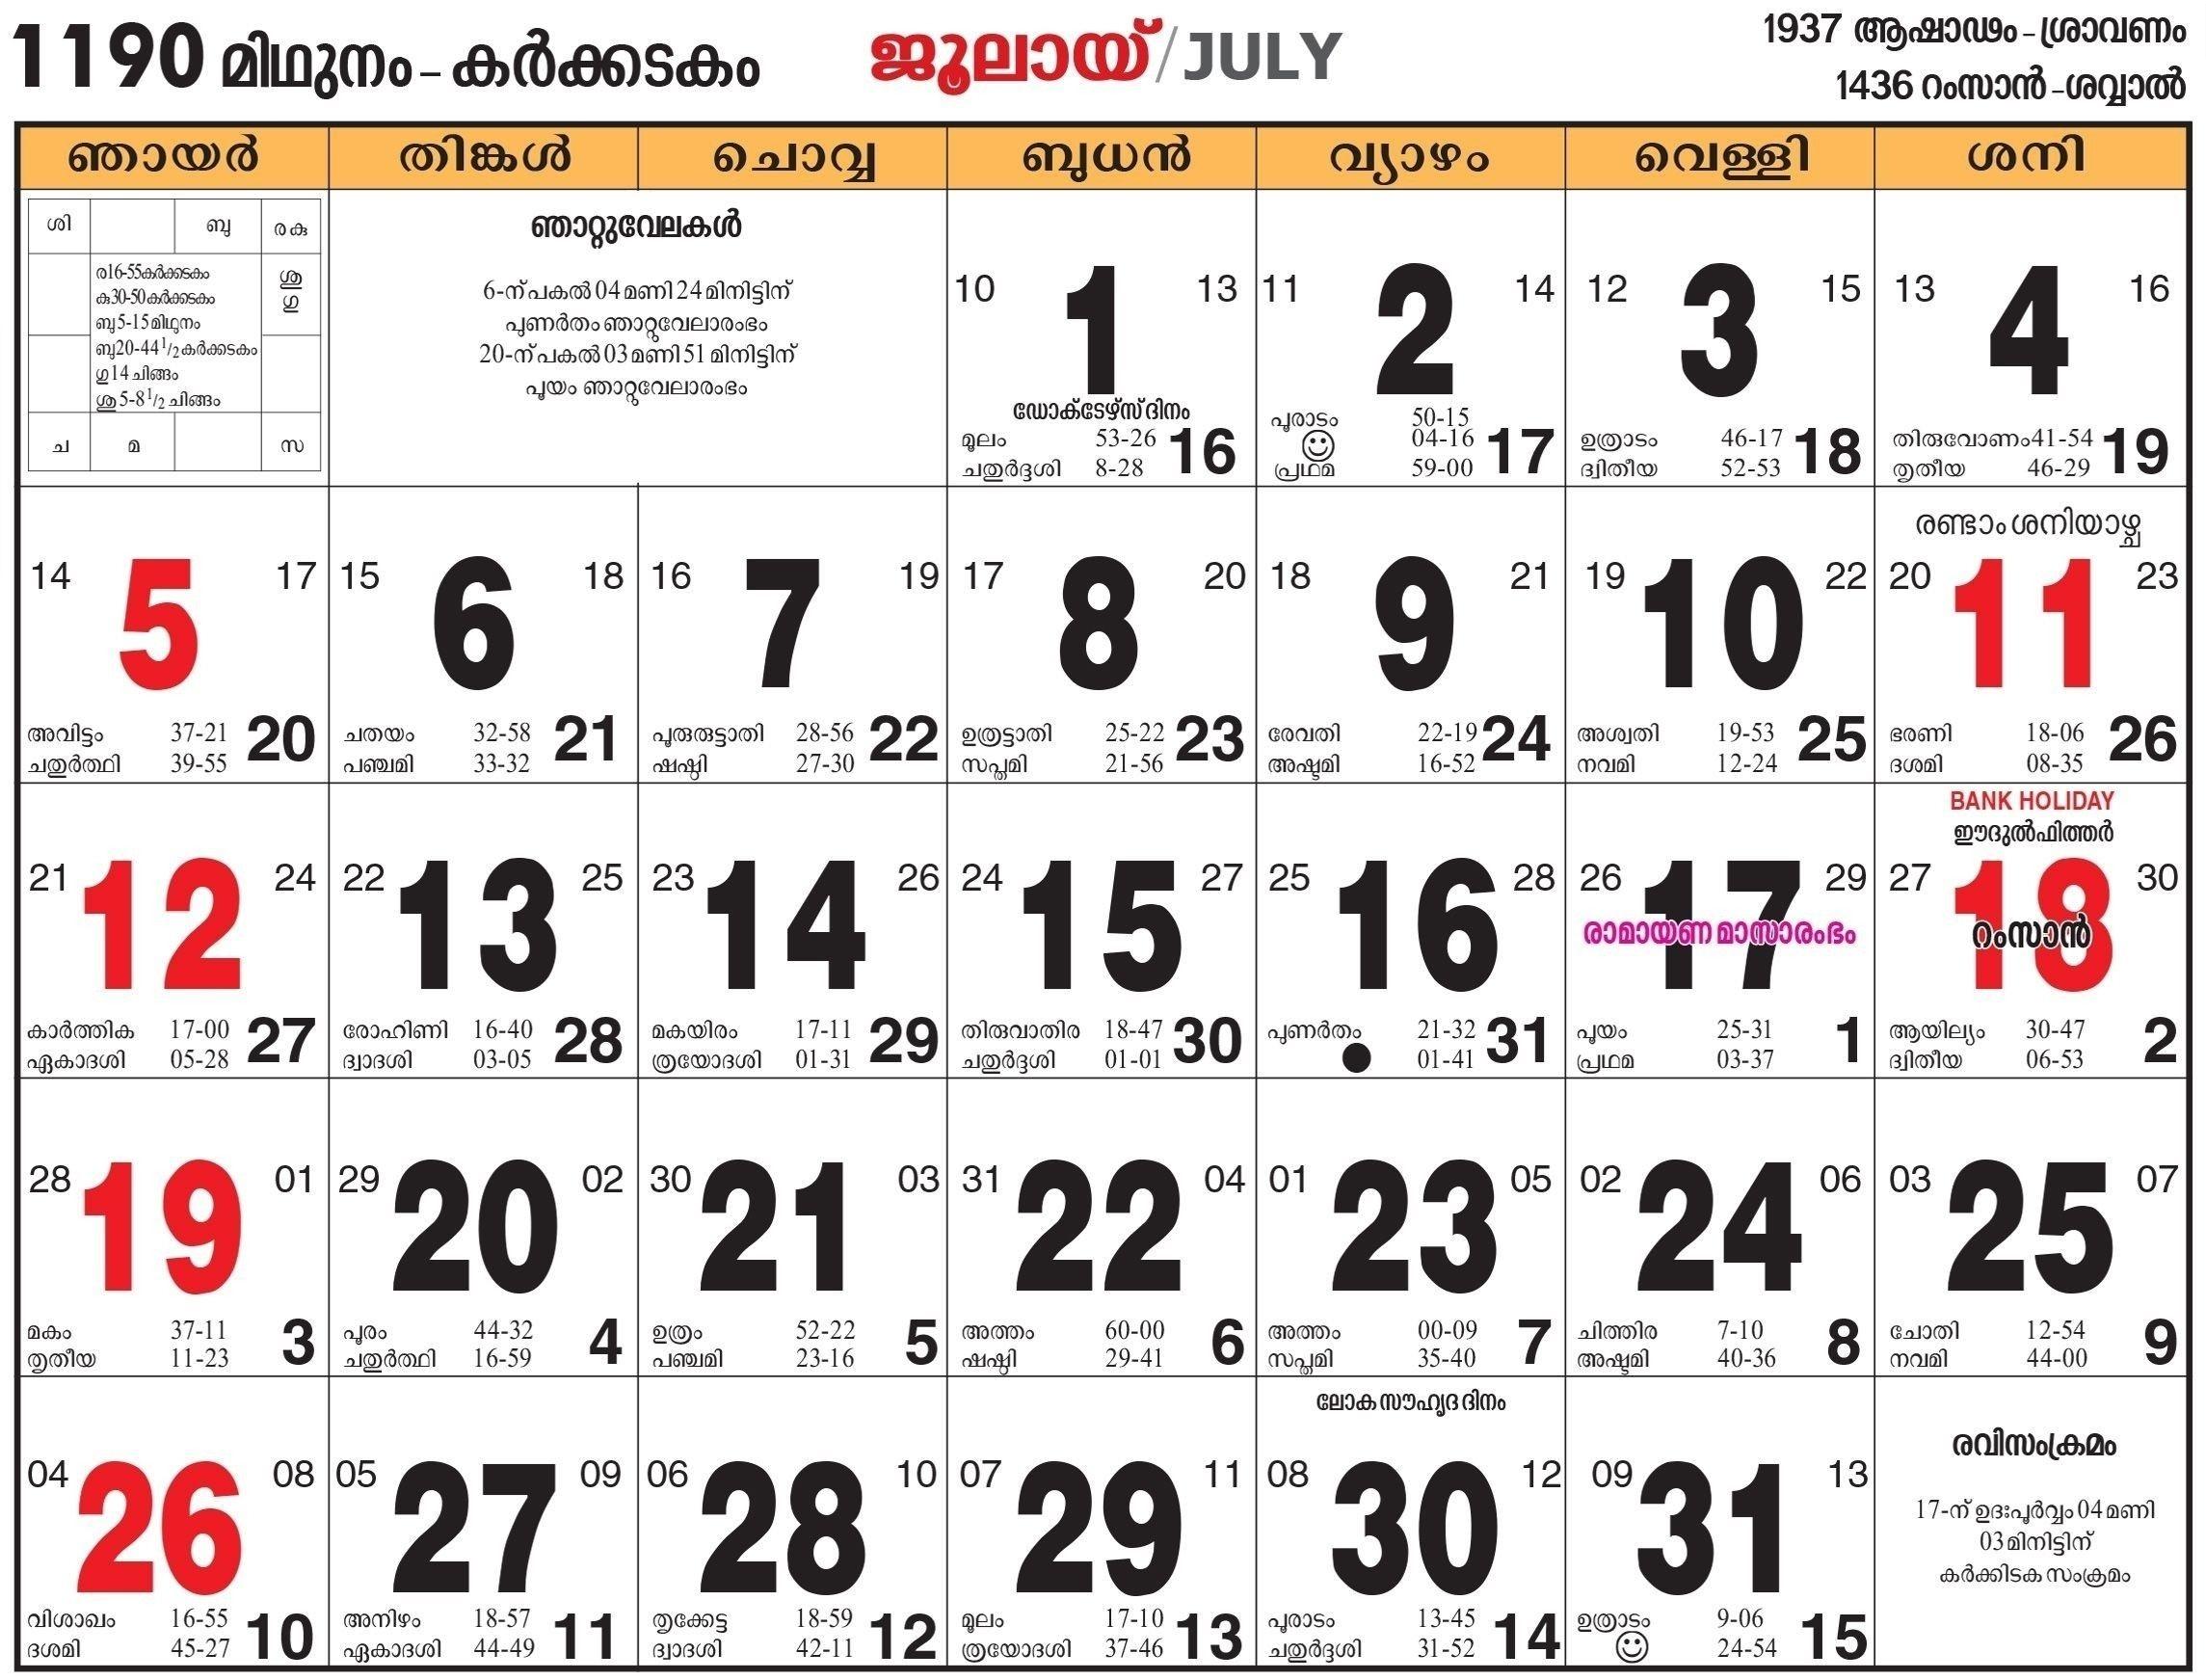 2020 Malayala Manorama Calendar Pdf - Template Calendar Design